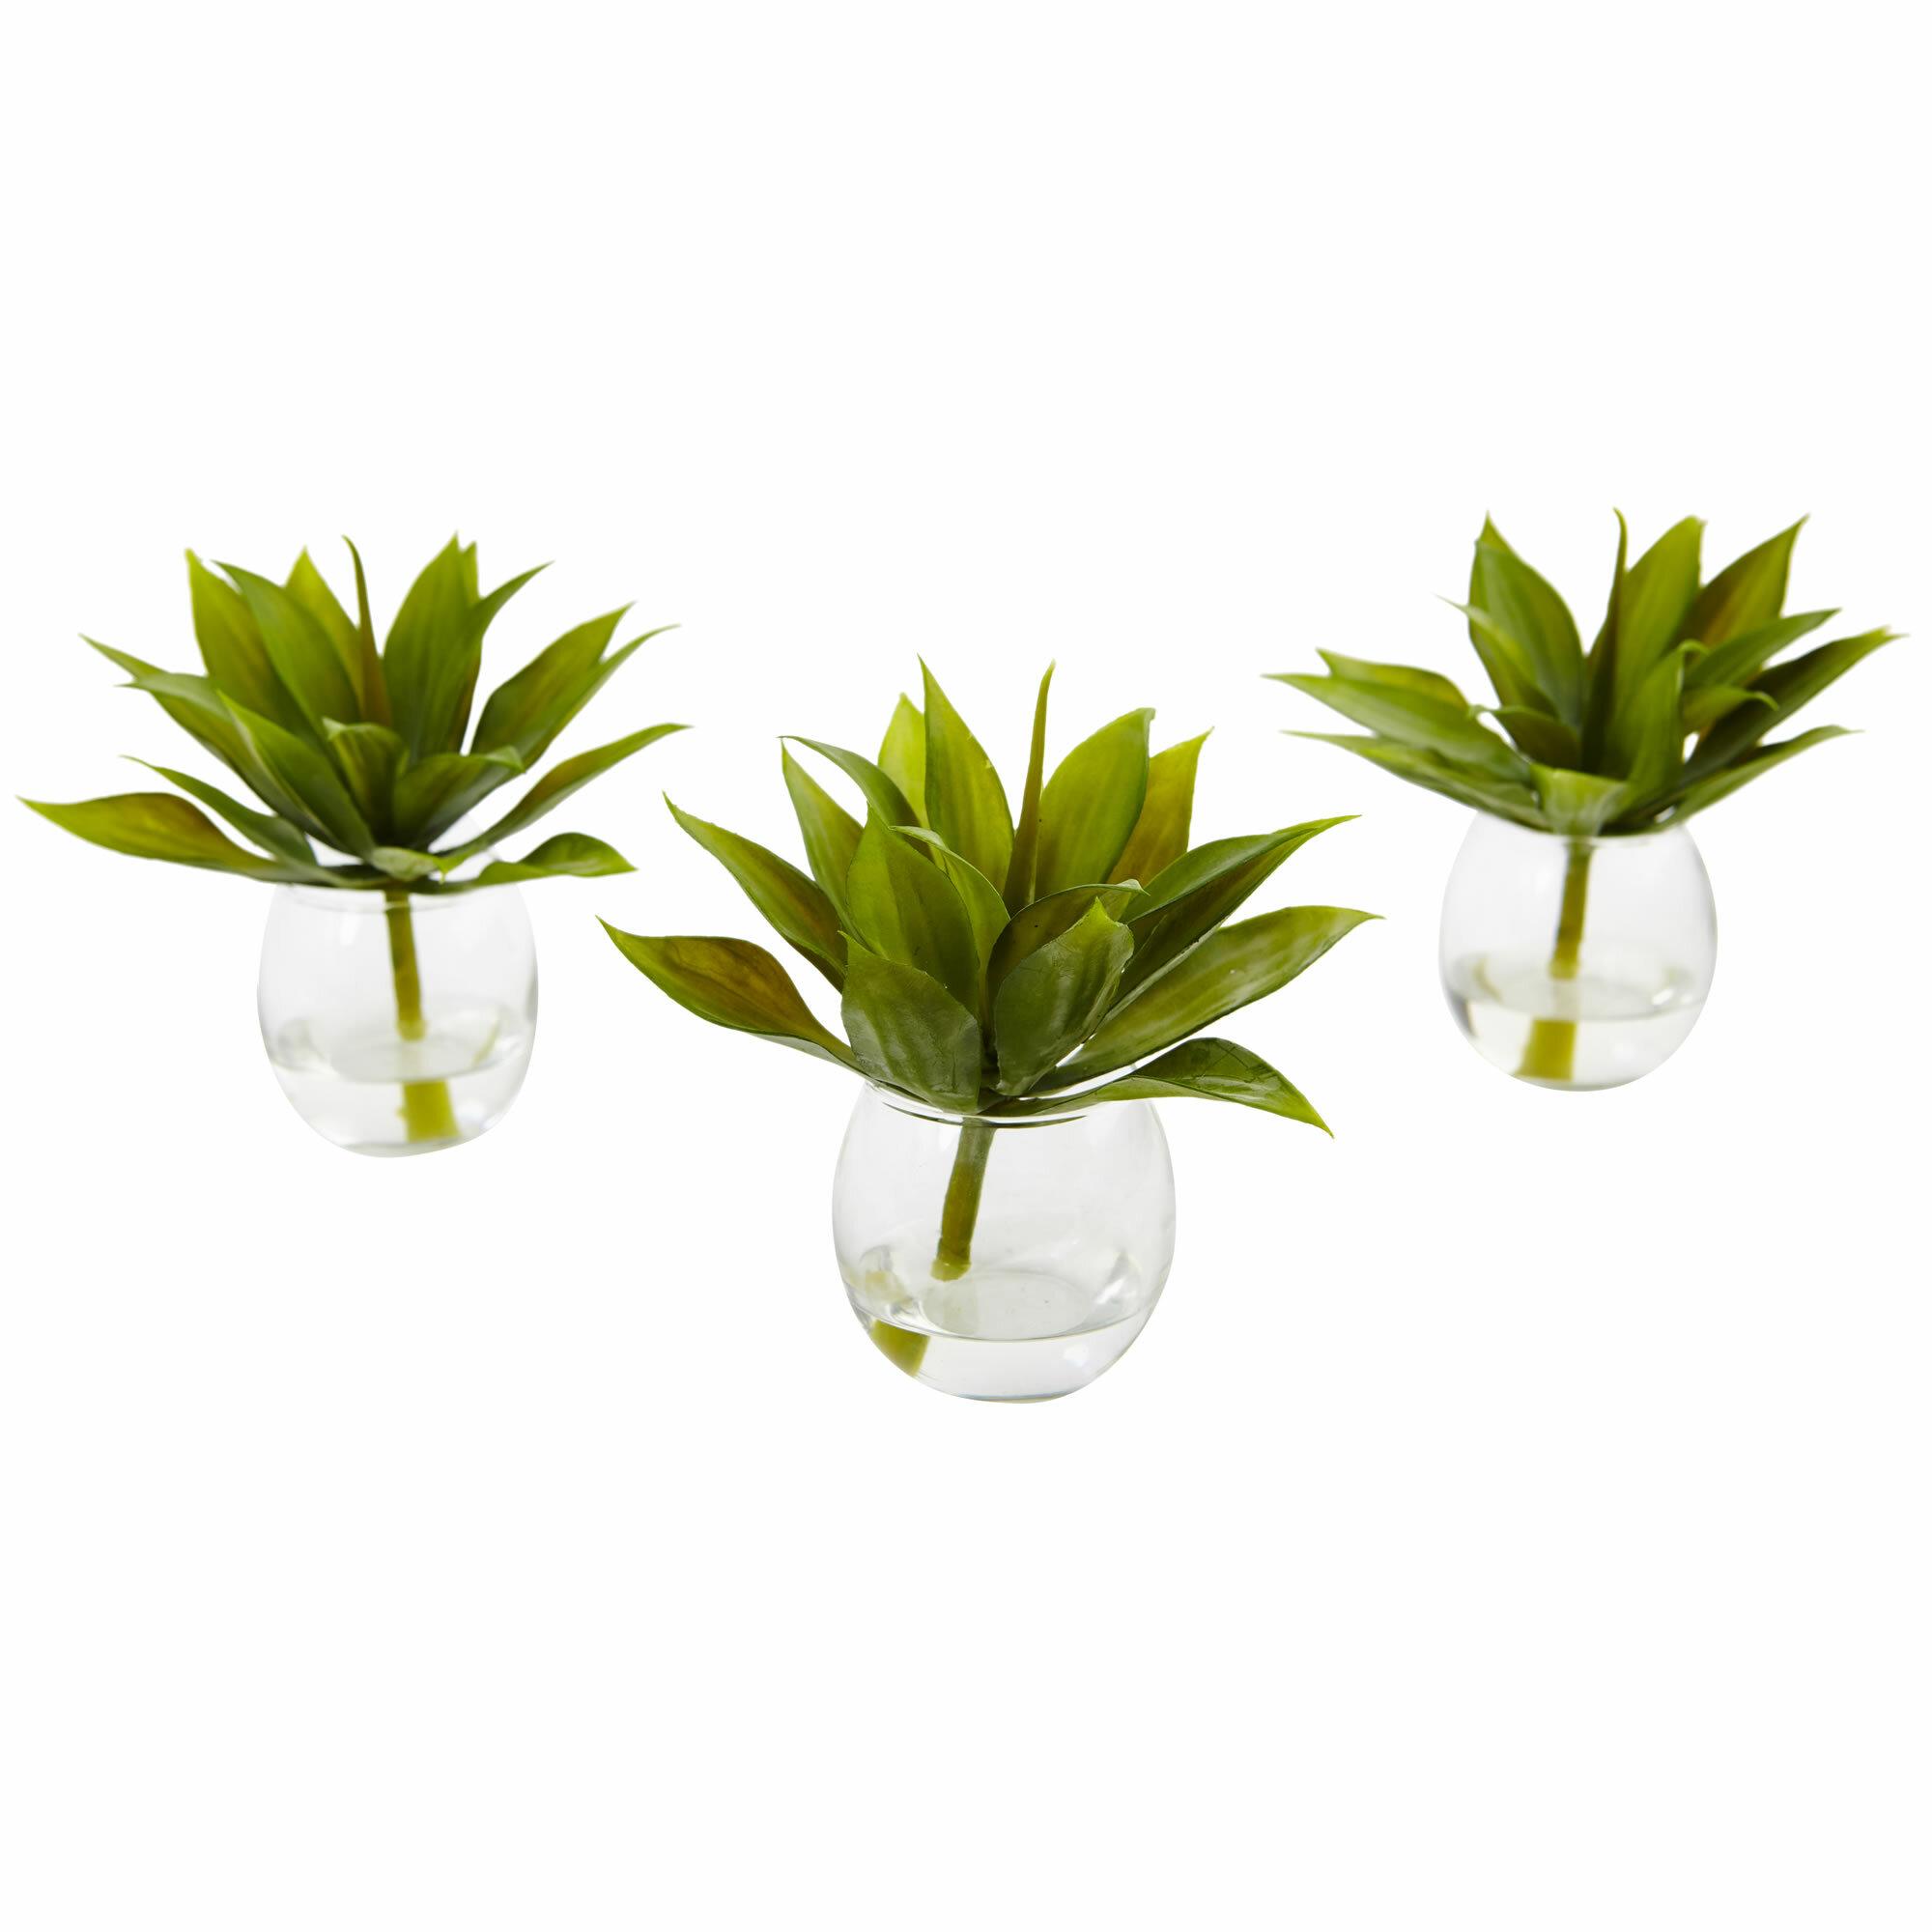 3 Piece Artificial Agave Plant In Decorative Vase Set Reviews